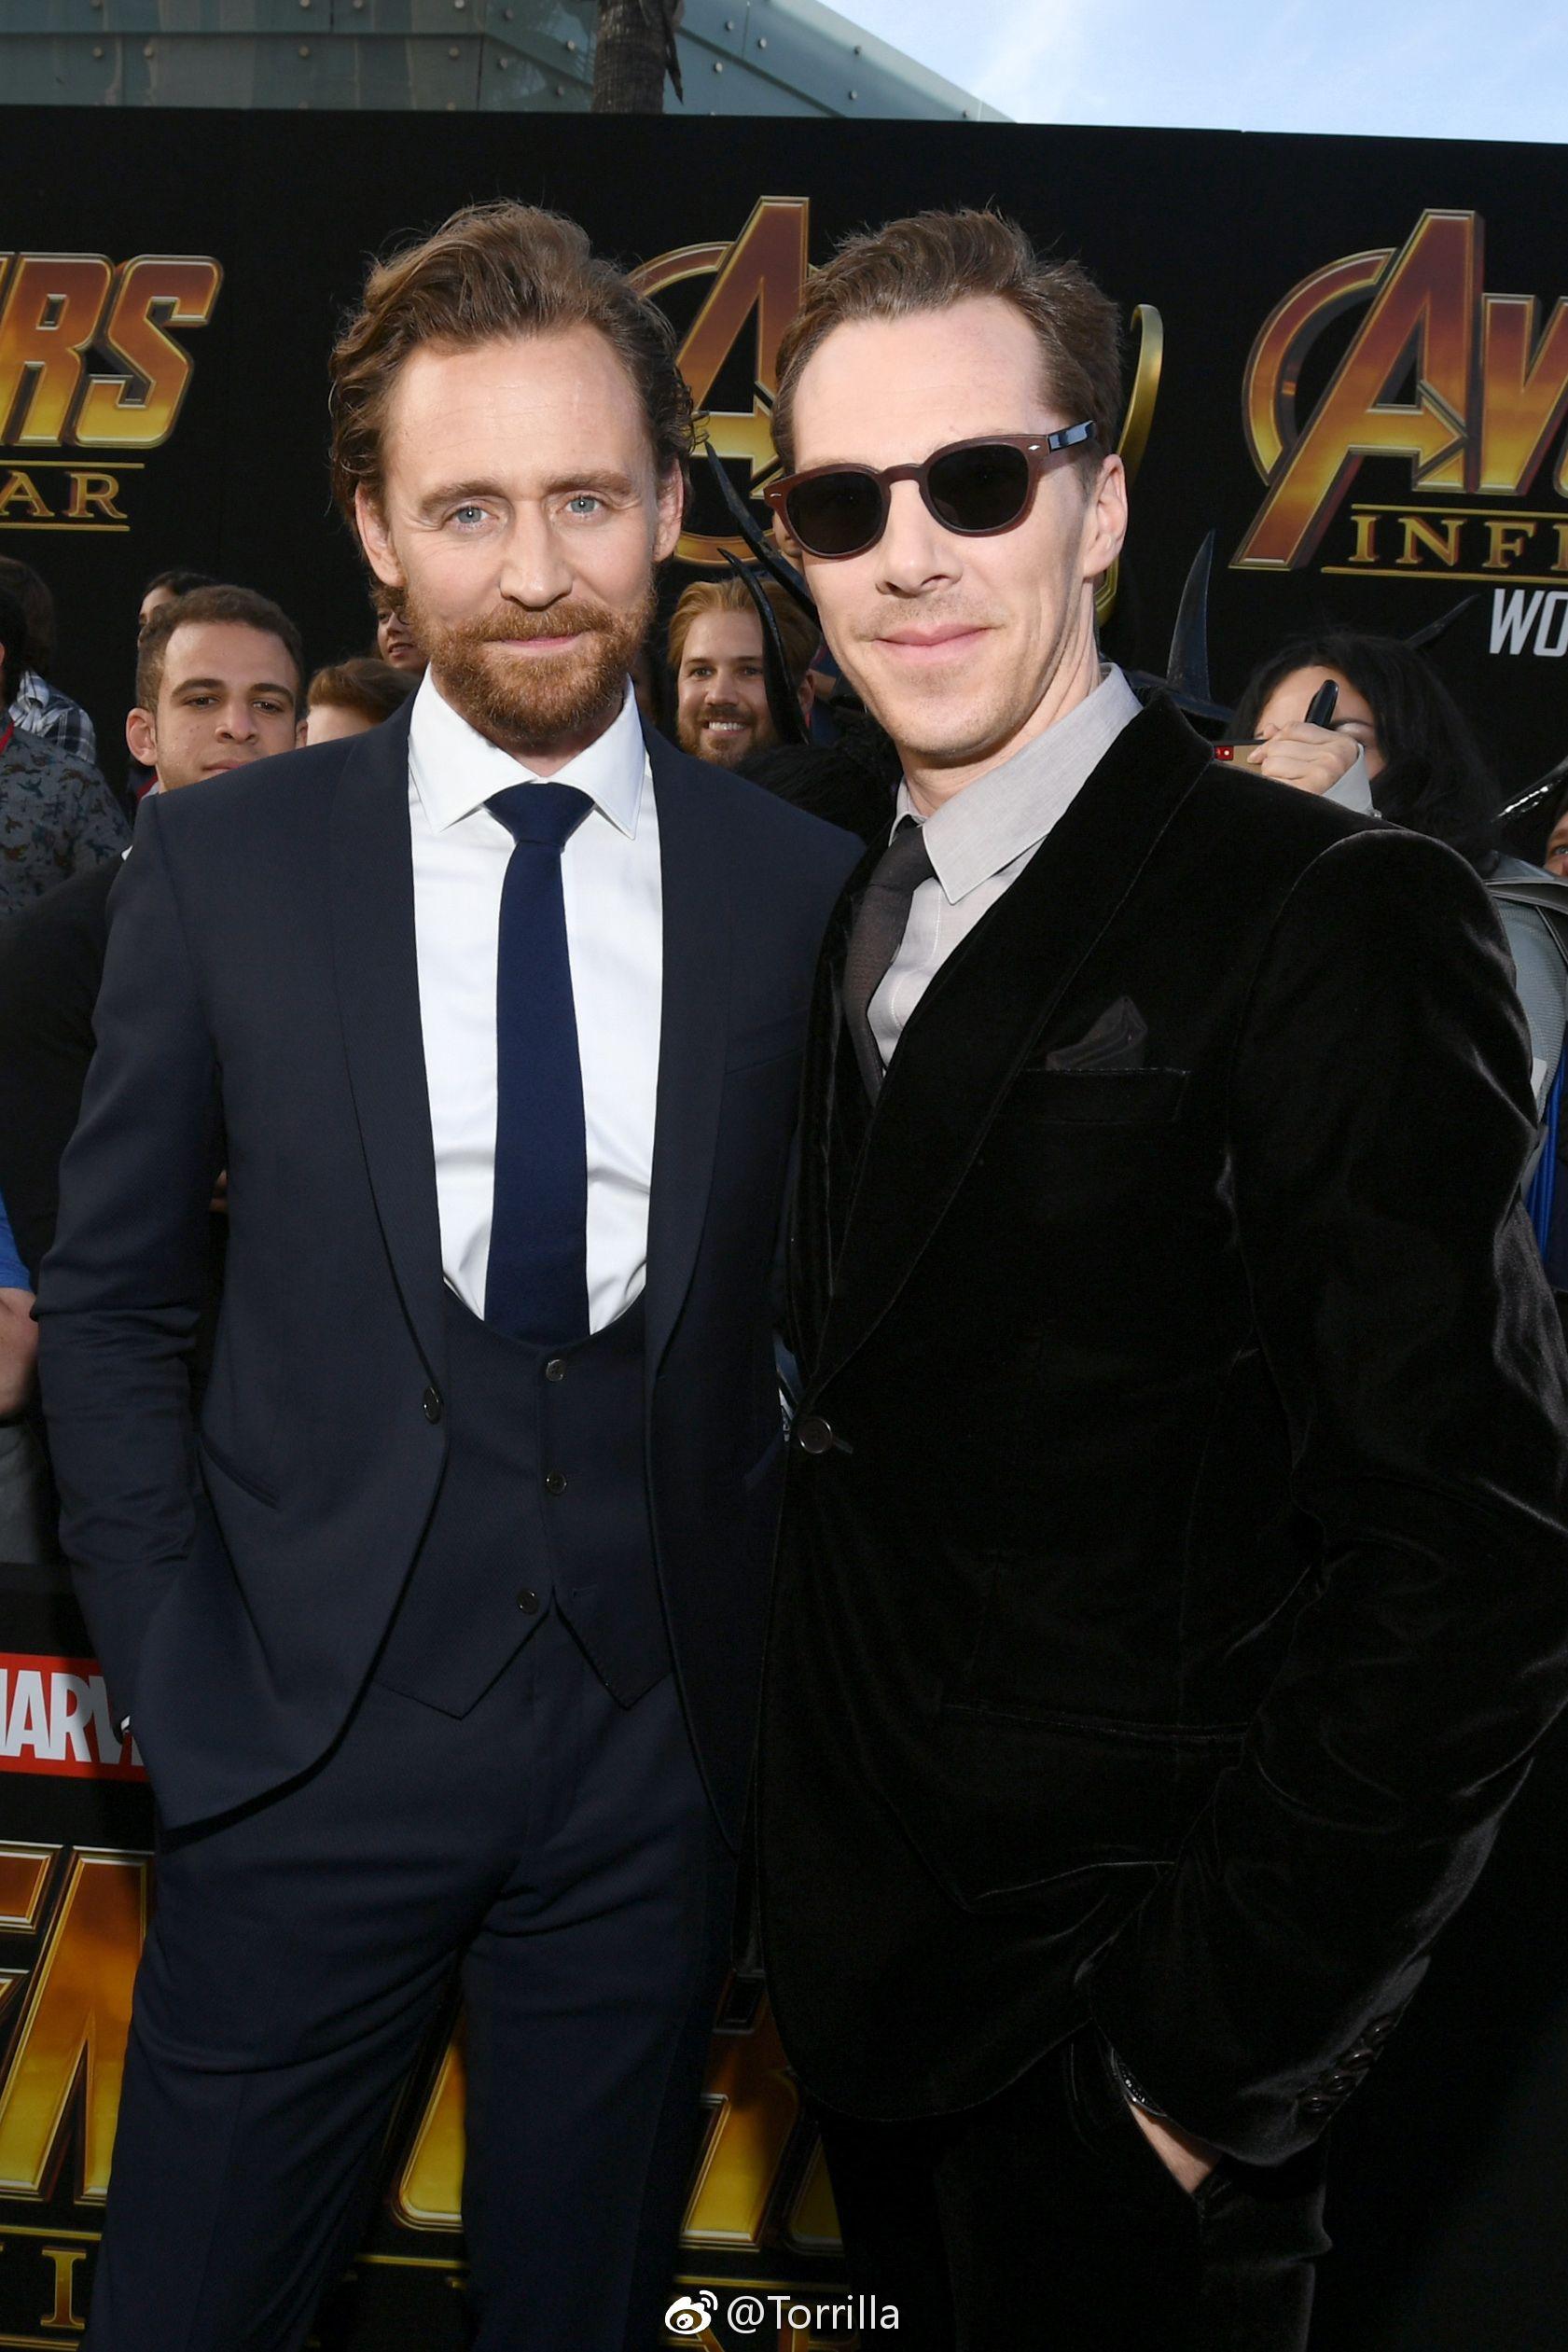 Tom Holland, Tom Hiddleston Benedict Cumberbatch Turned Wimbledon Into A Stylish Marvel Reunion